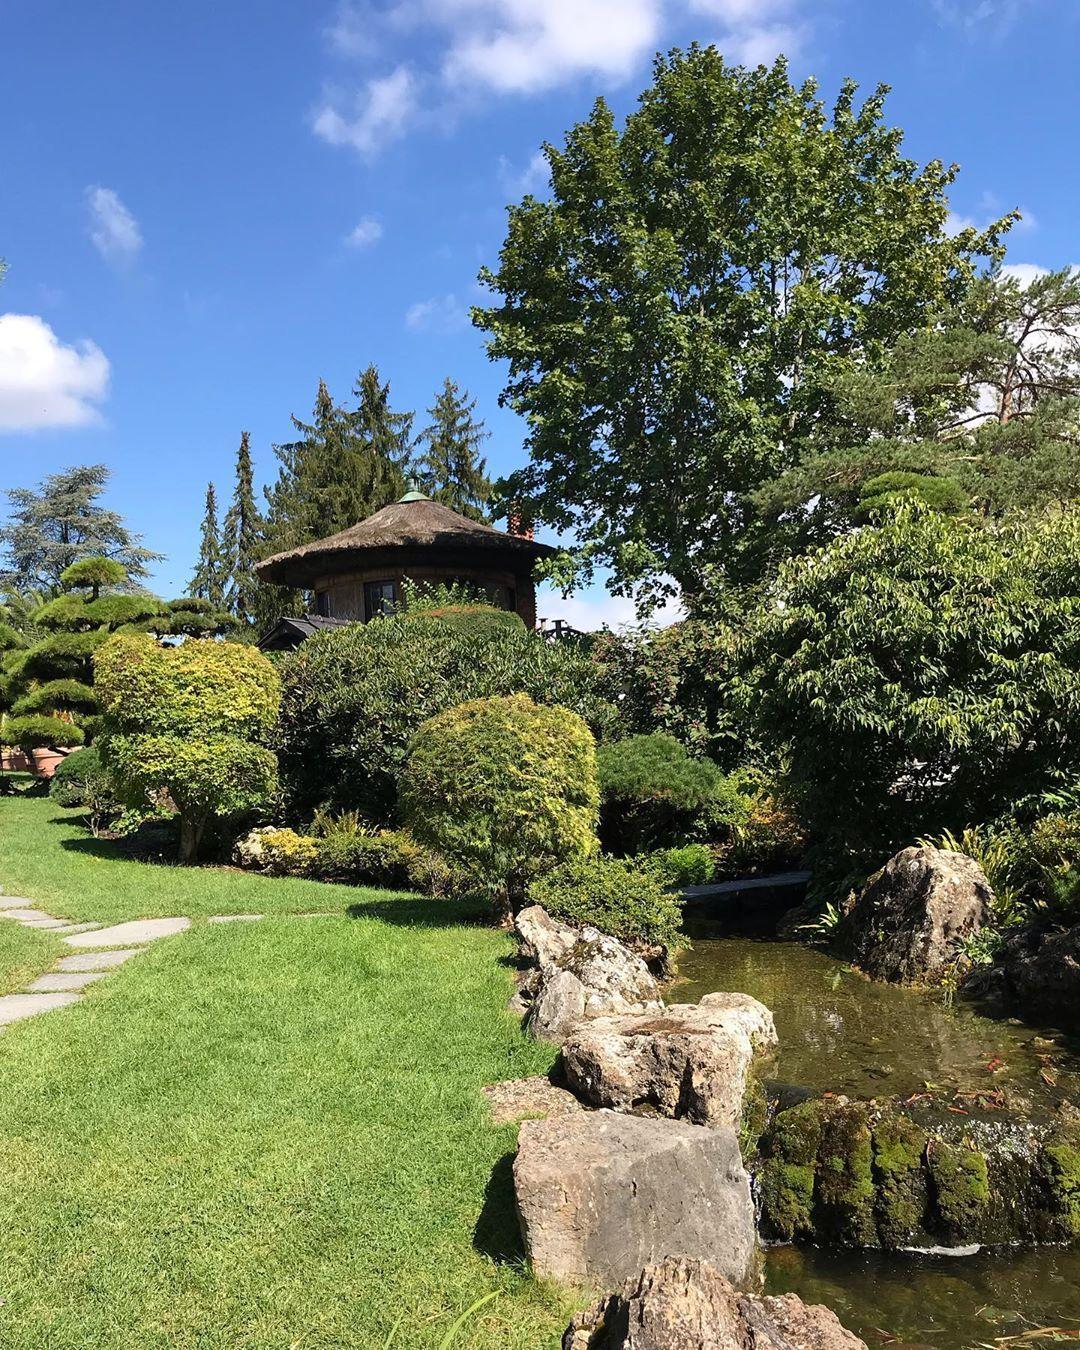 Japanischer Garten Bluhendesbarock Bluhendesbarockludwigsburg Ludwigsburg Schlossludwigsburg Japanischer Garten Garten Bluhendes Barock Ludwigsburg